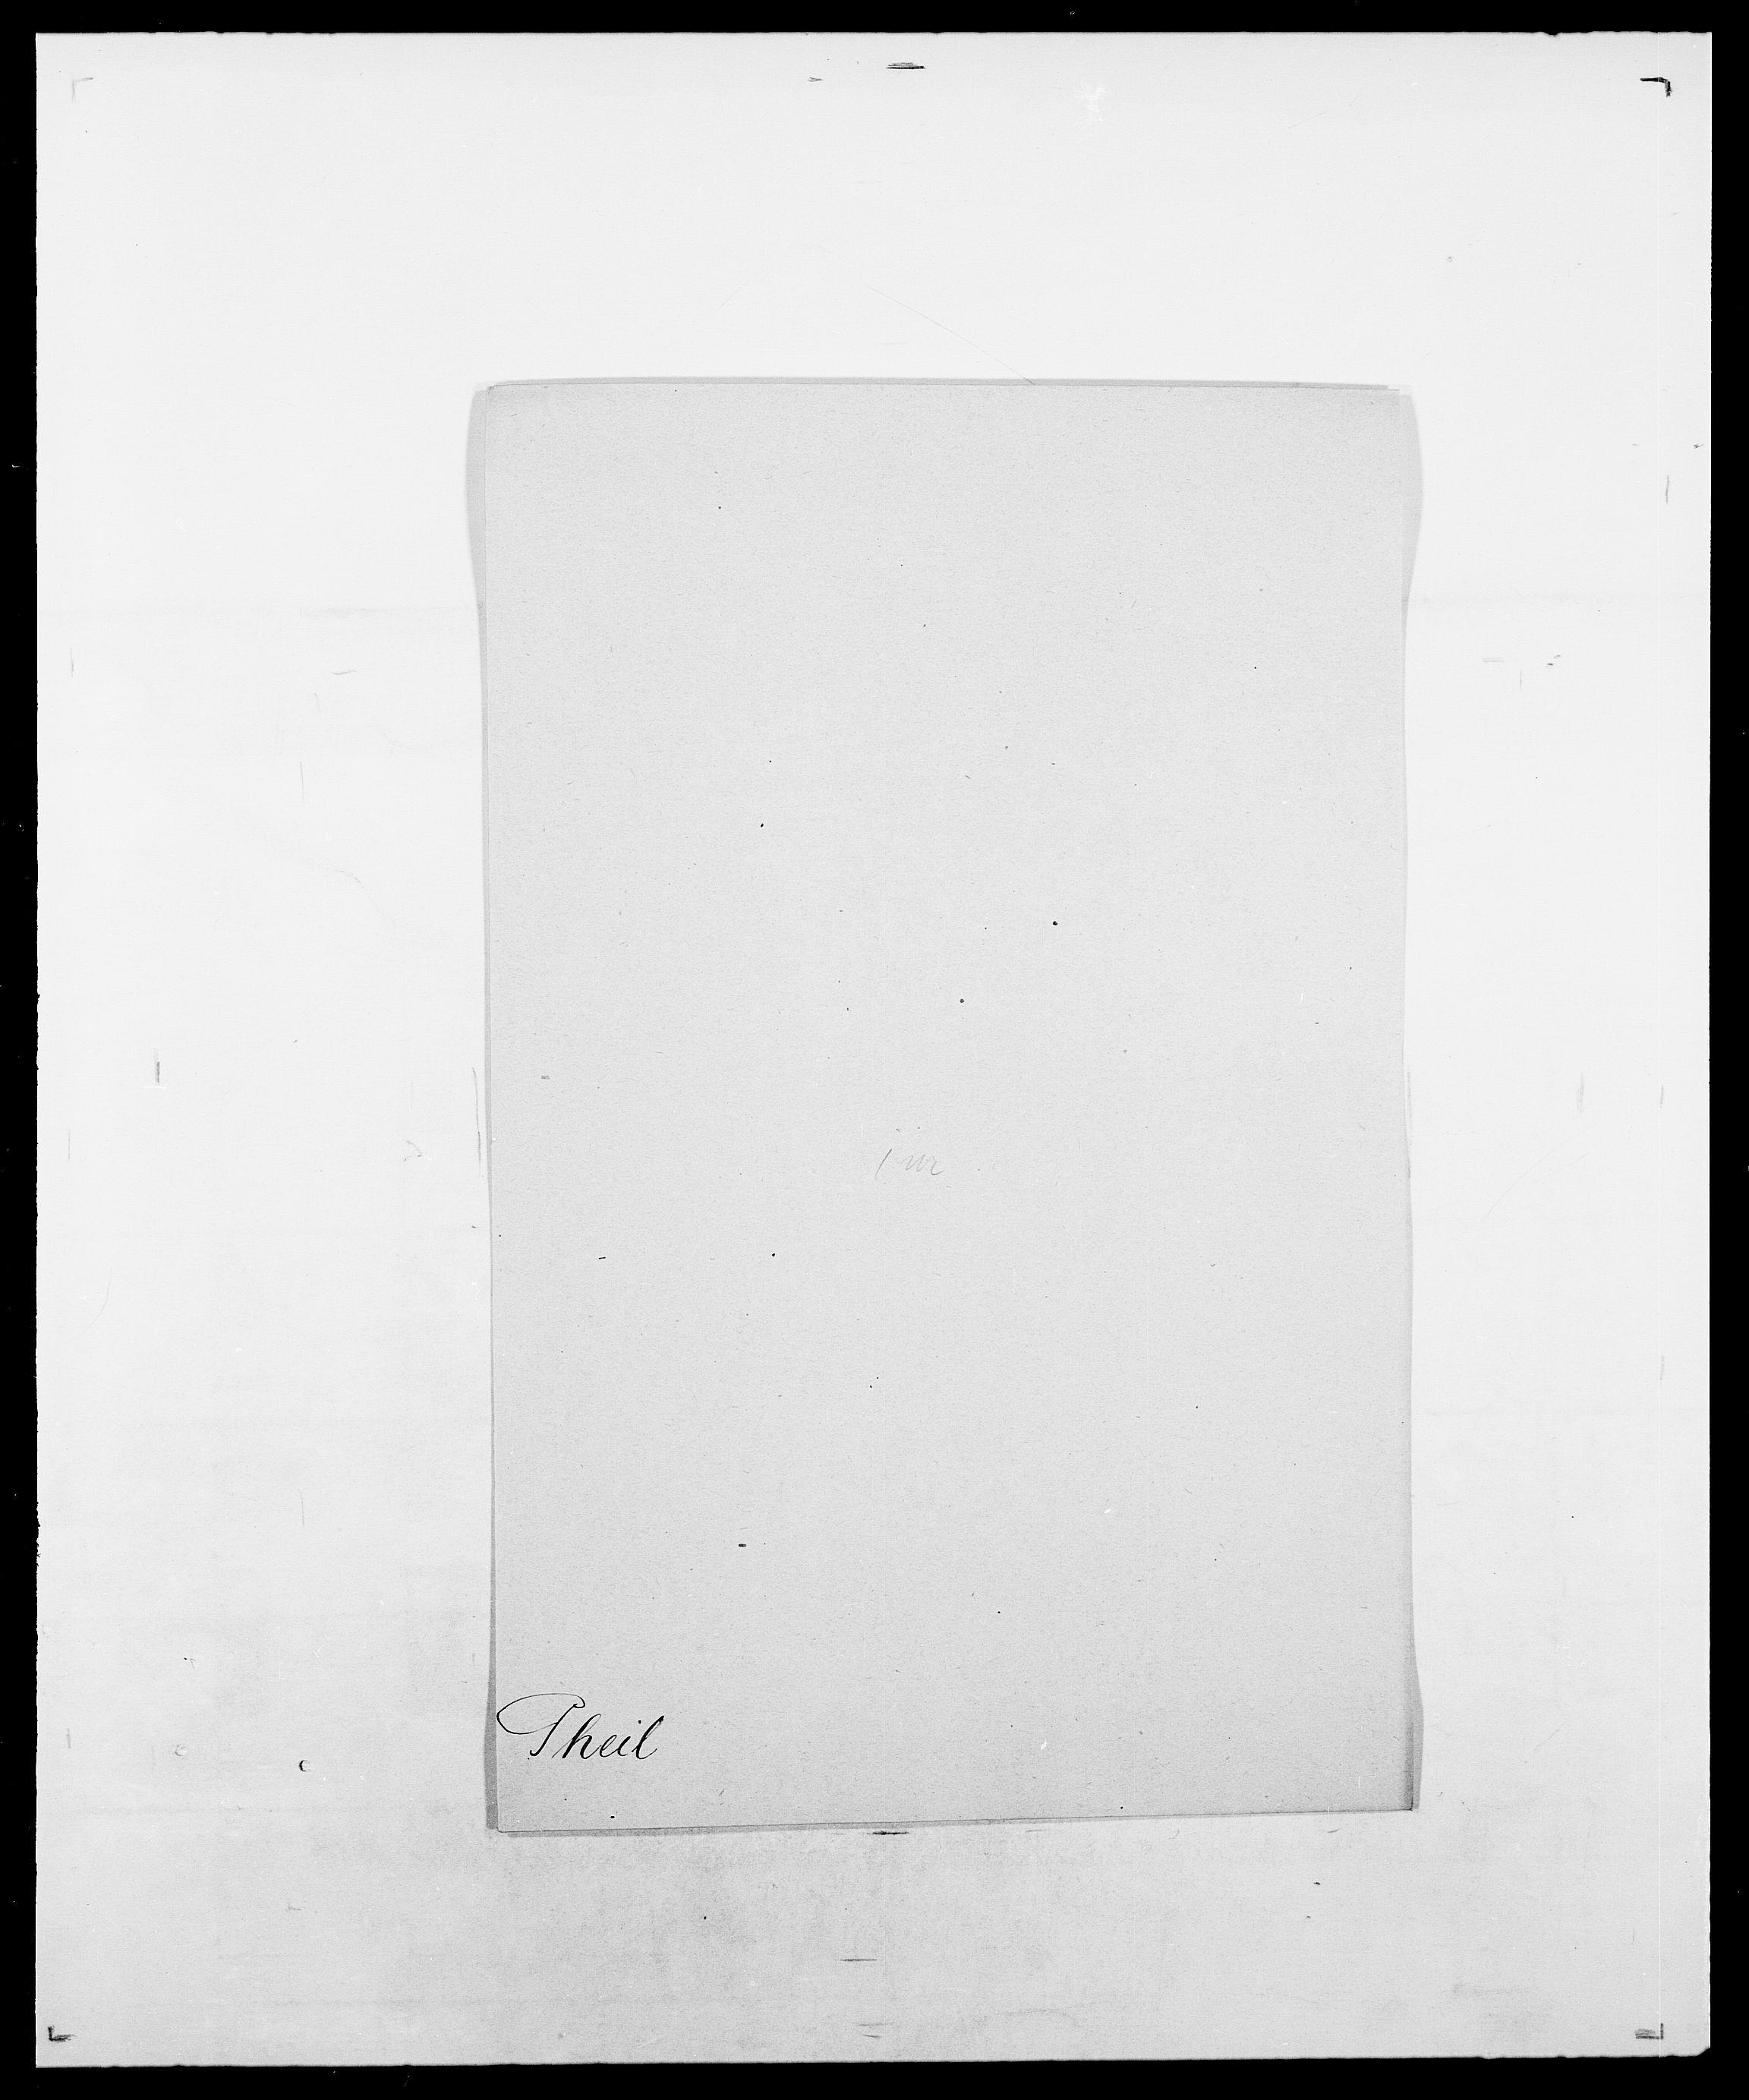 SAO, Delgobe, Charles Antoine - samling, D/Da/L0030: Paars - Pittelkov, s. 514